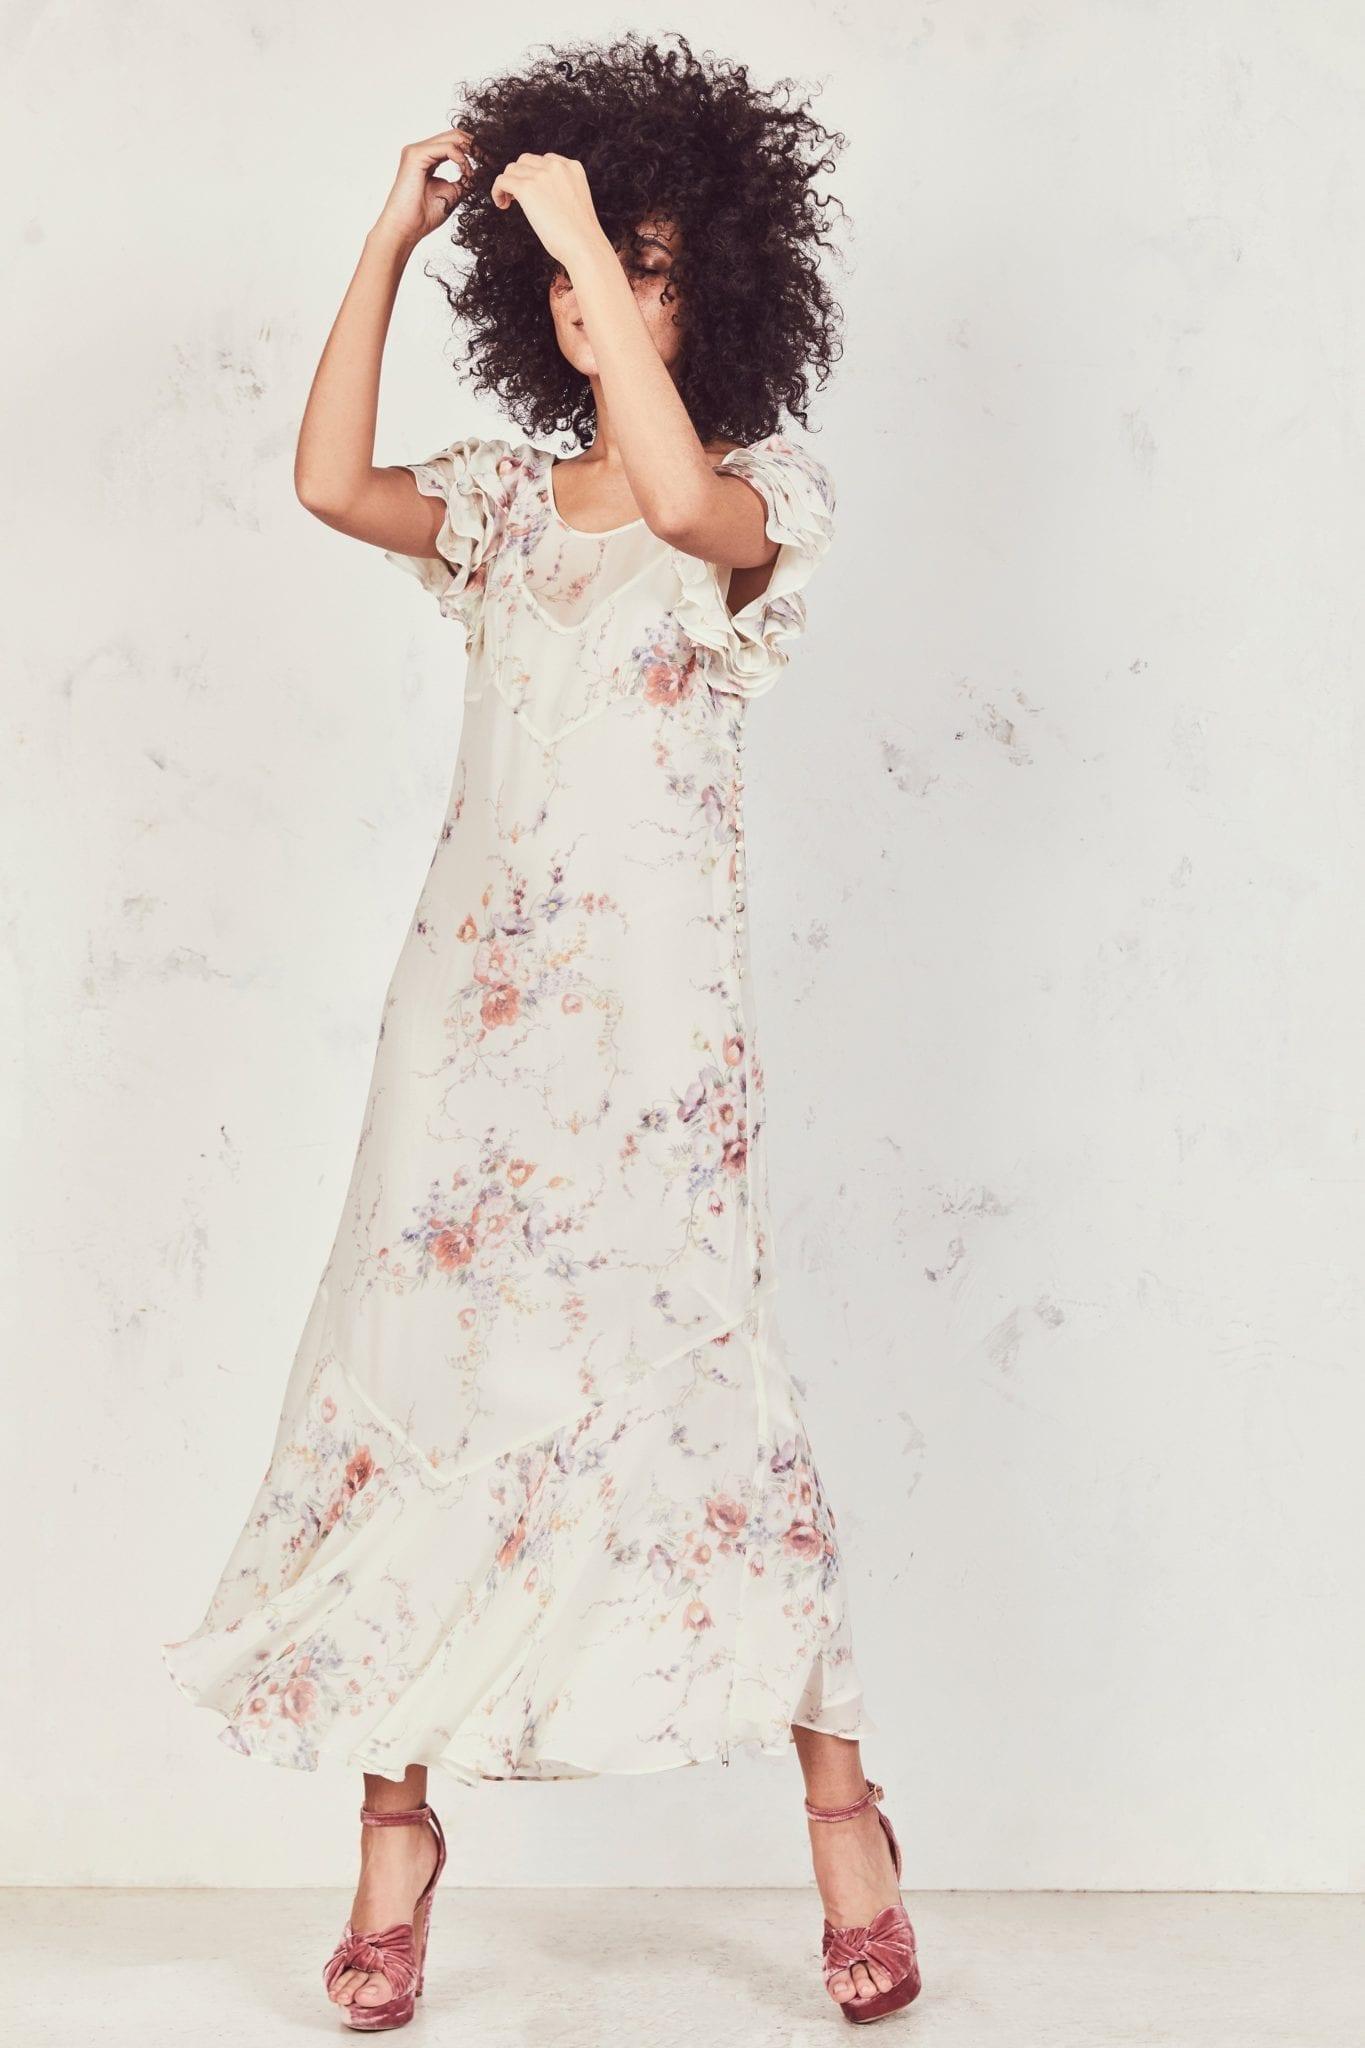 LOVESHACKFANCY Sloane White / Floral Printed Dress